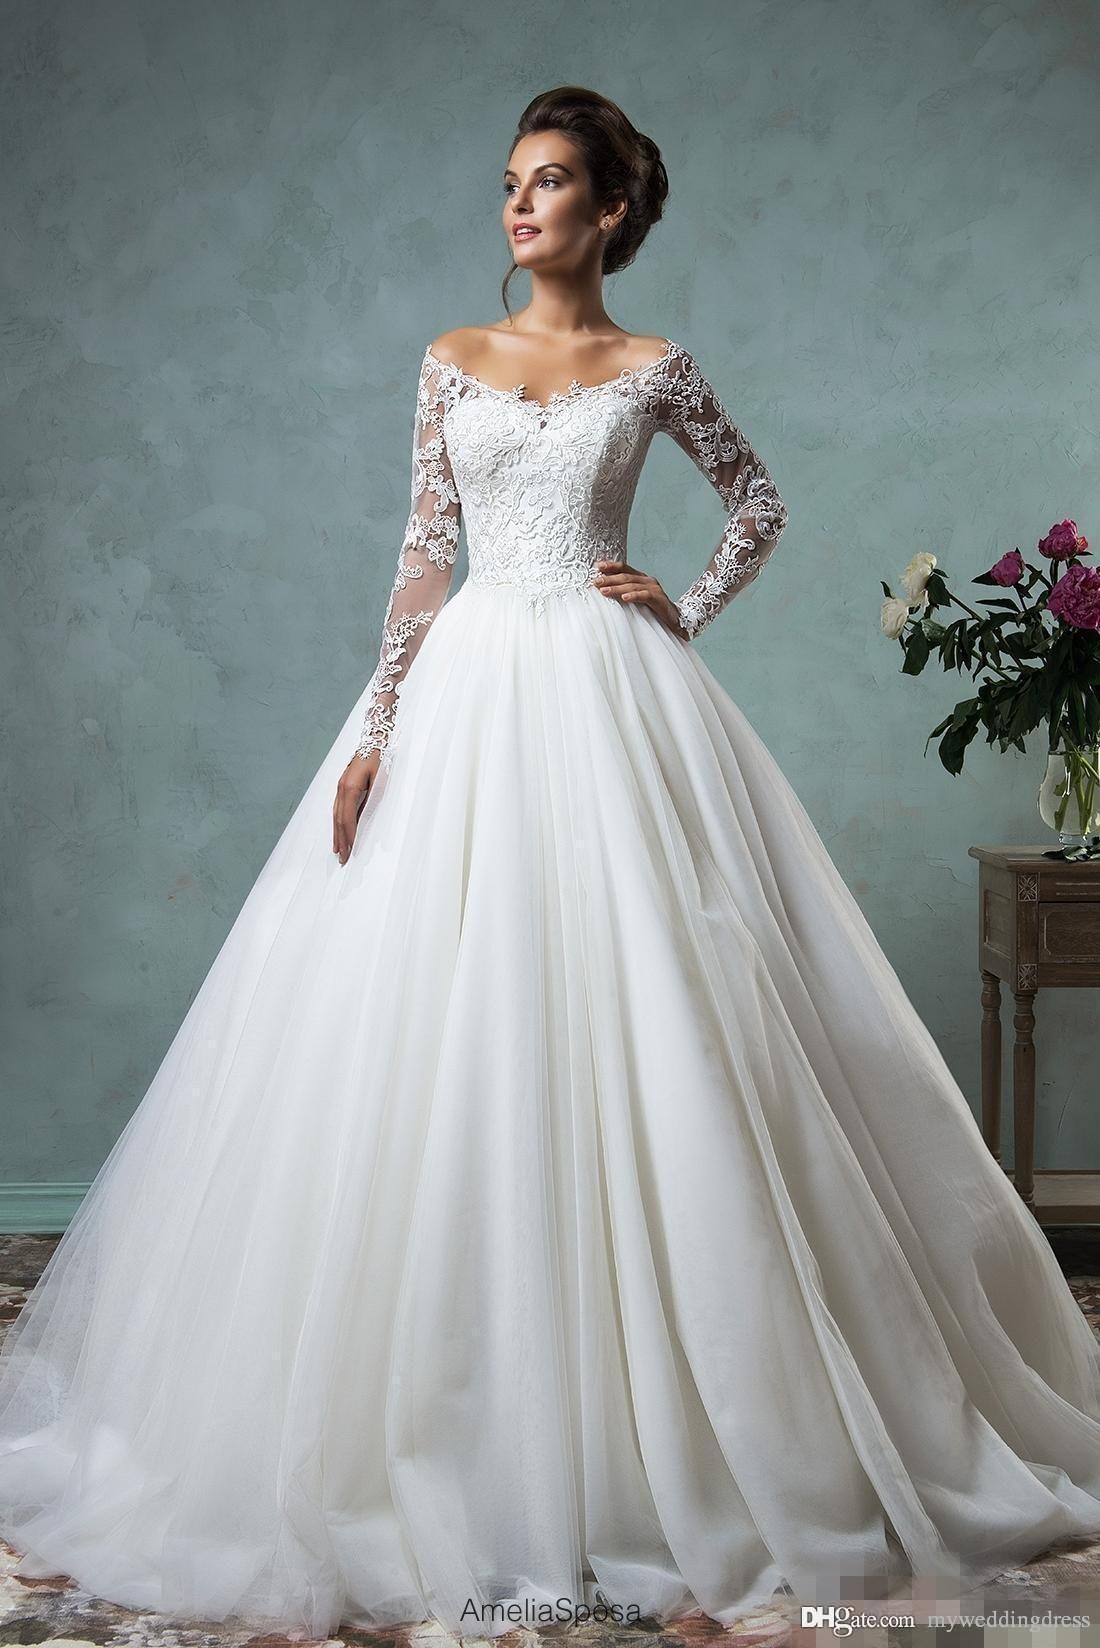 2017 Beach Vintage Long Sleeve Wedding Dresses Lace Applique Bridal ...